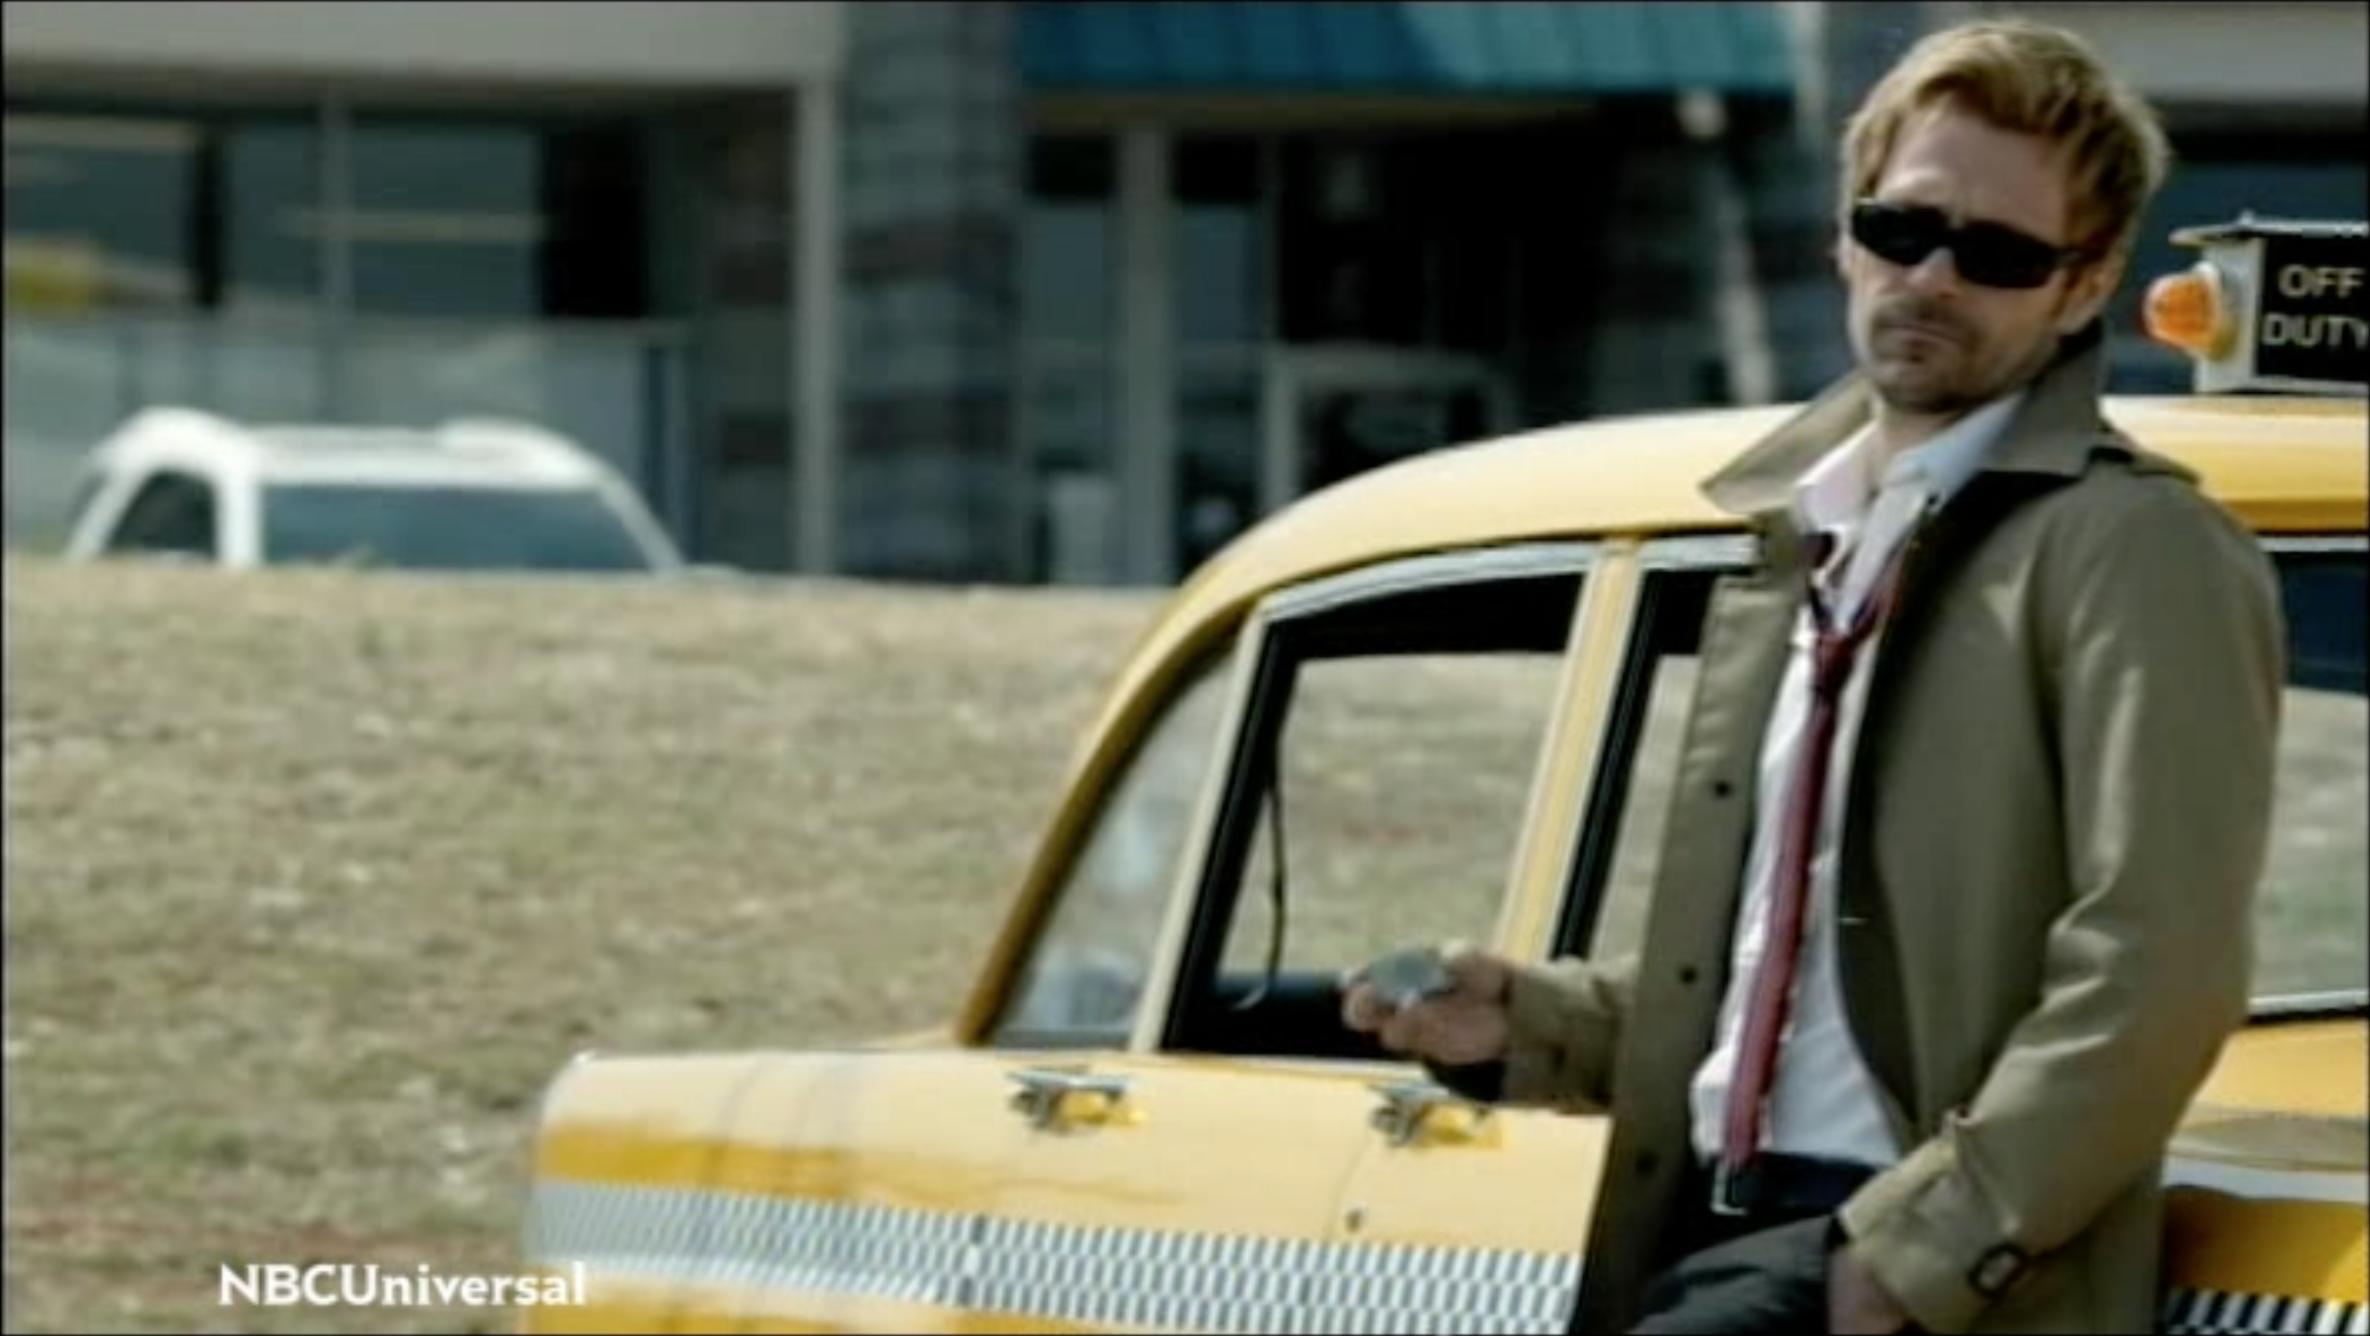 Constantine S01E01 'Pilot'